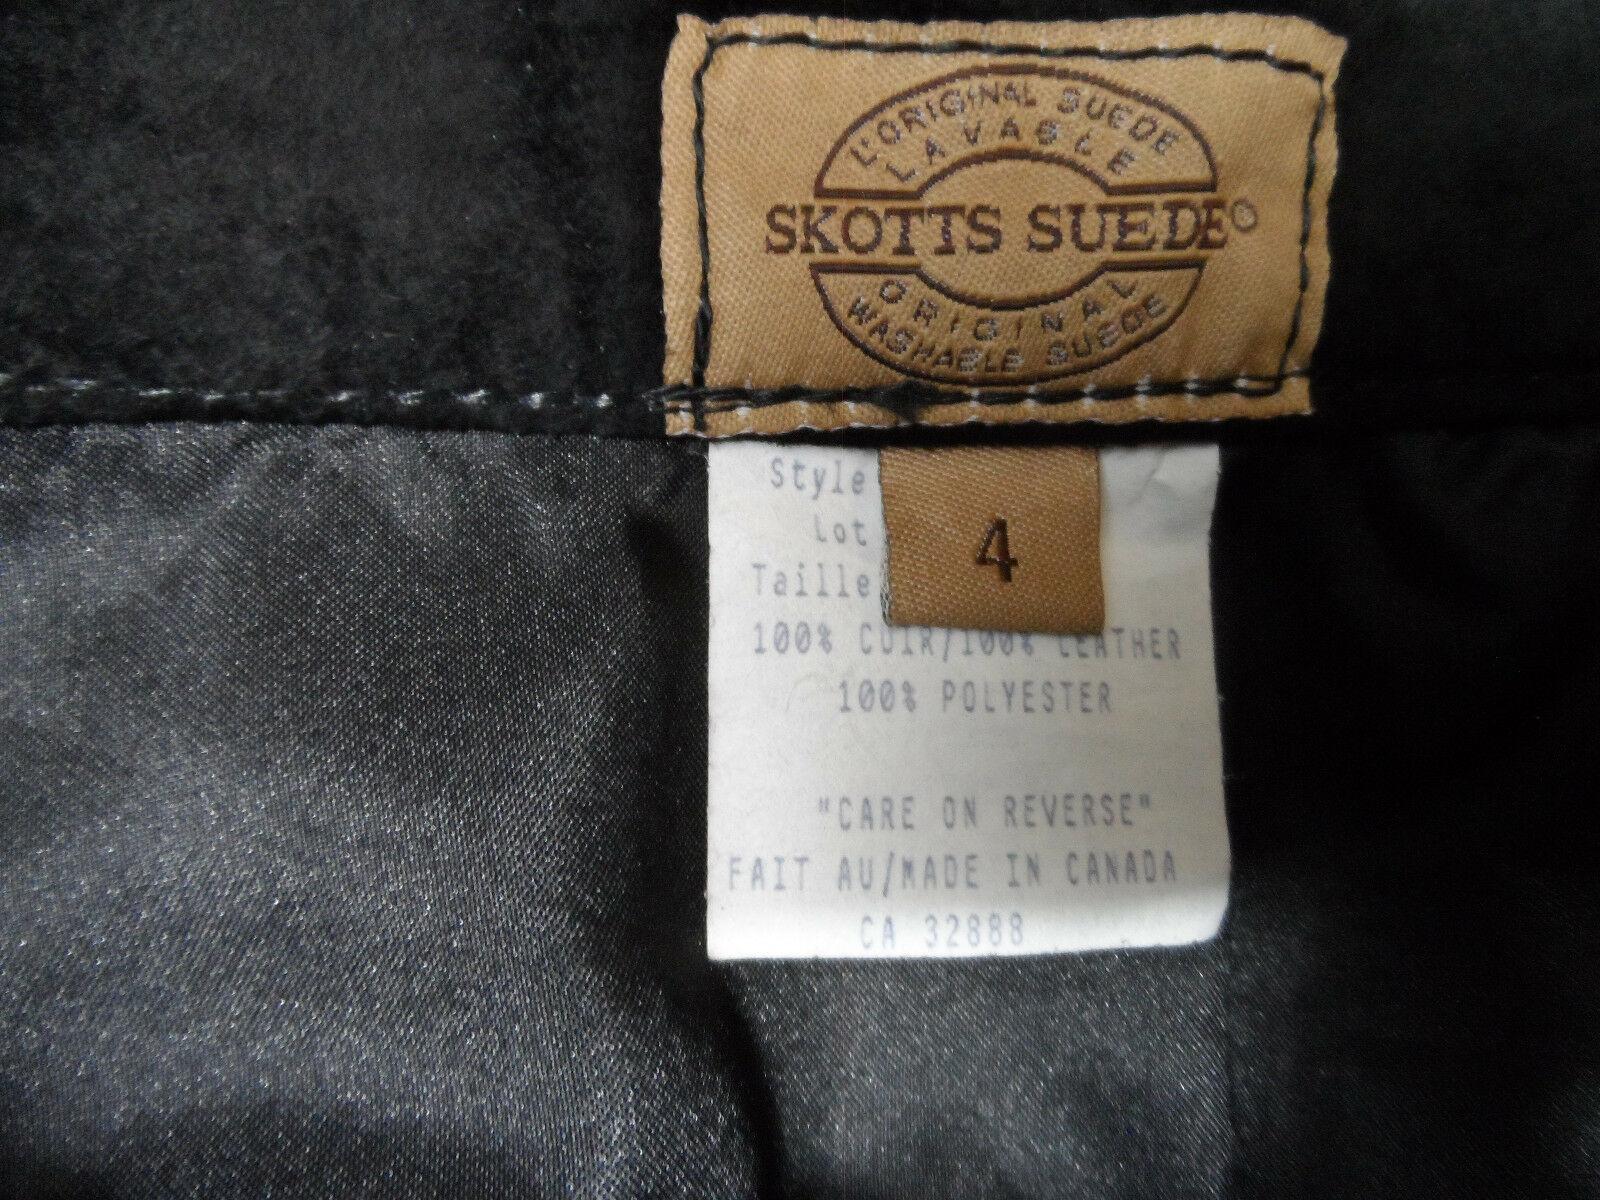 SKOTTS SUEDE Washable Leather Skirt sz 4 Black Midi Straight pencil fit Canadian image 7